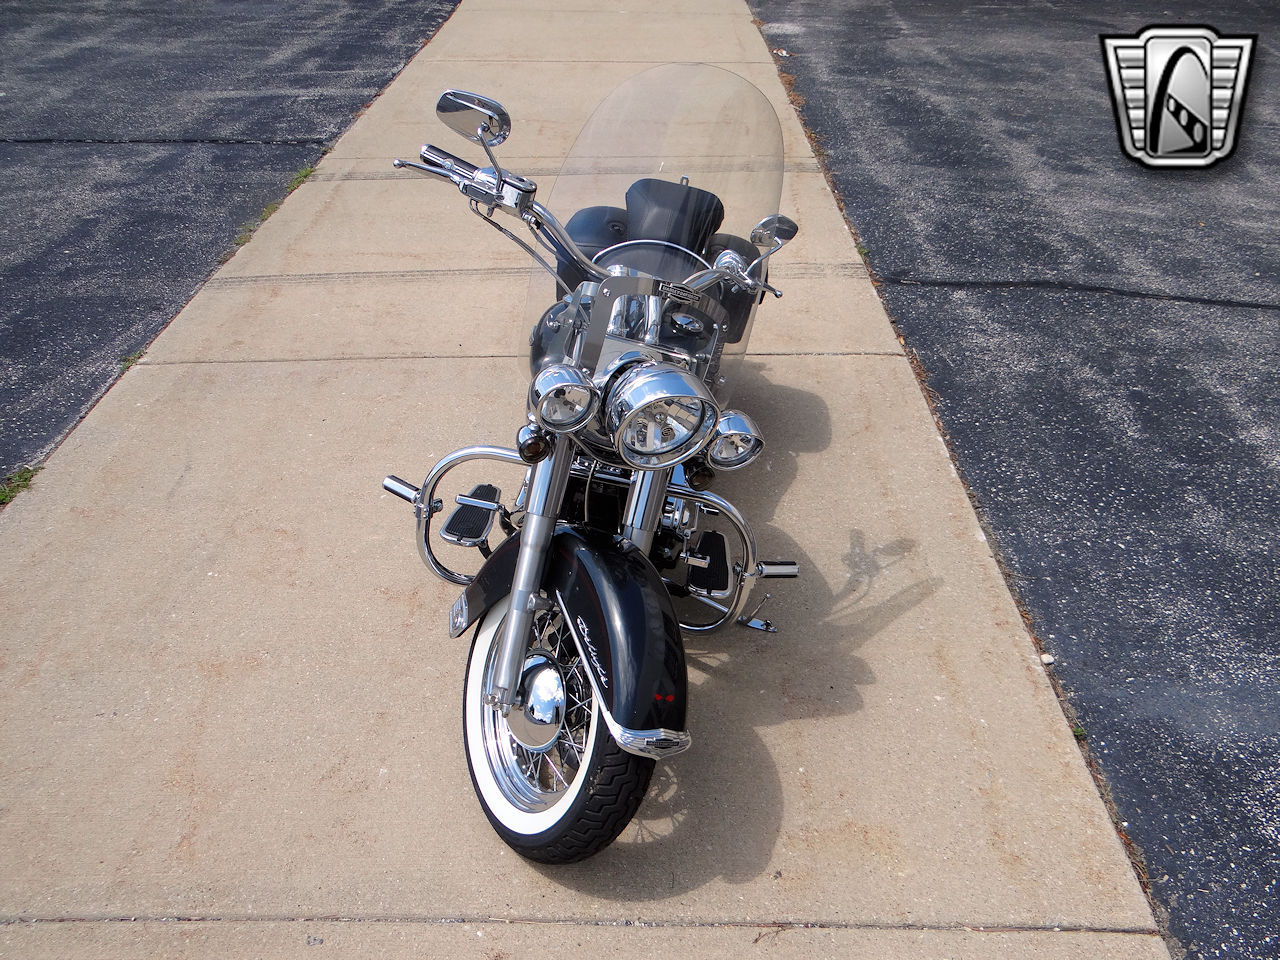 2006 Harley Davidson FLSTNI 21